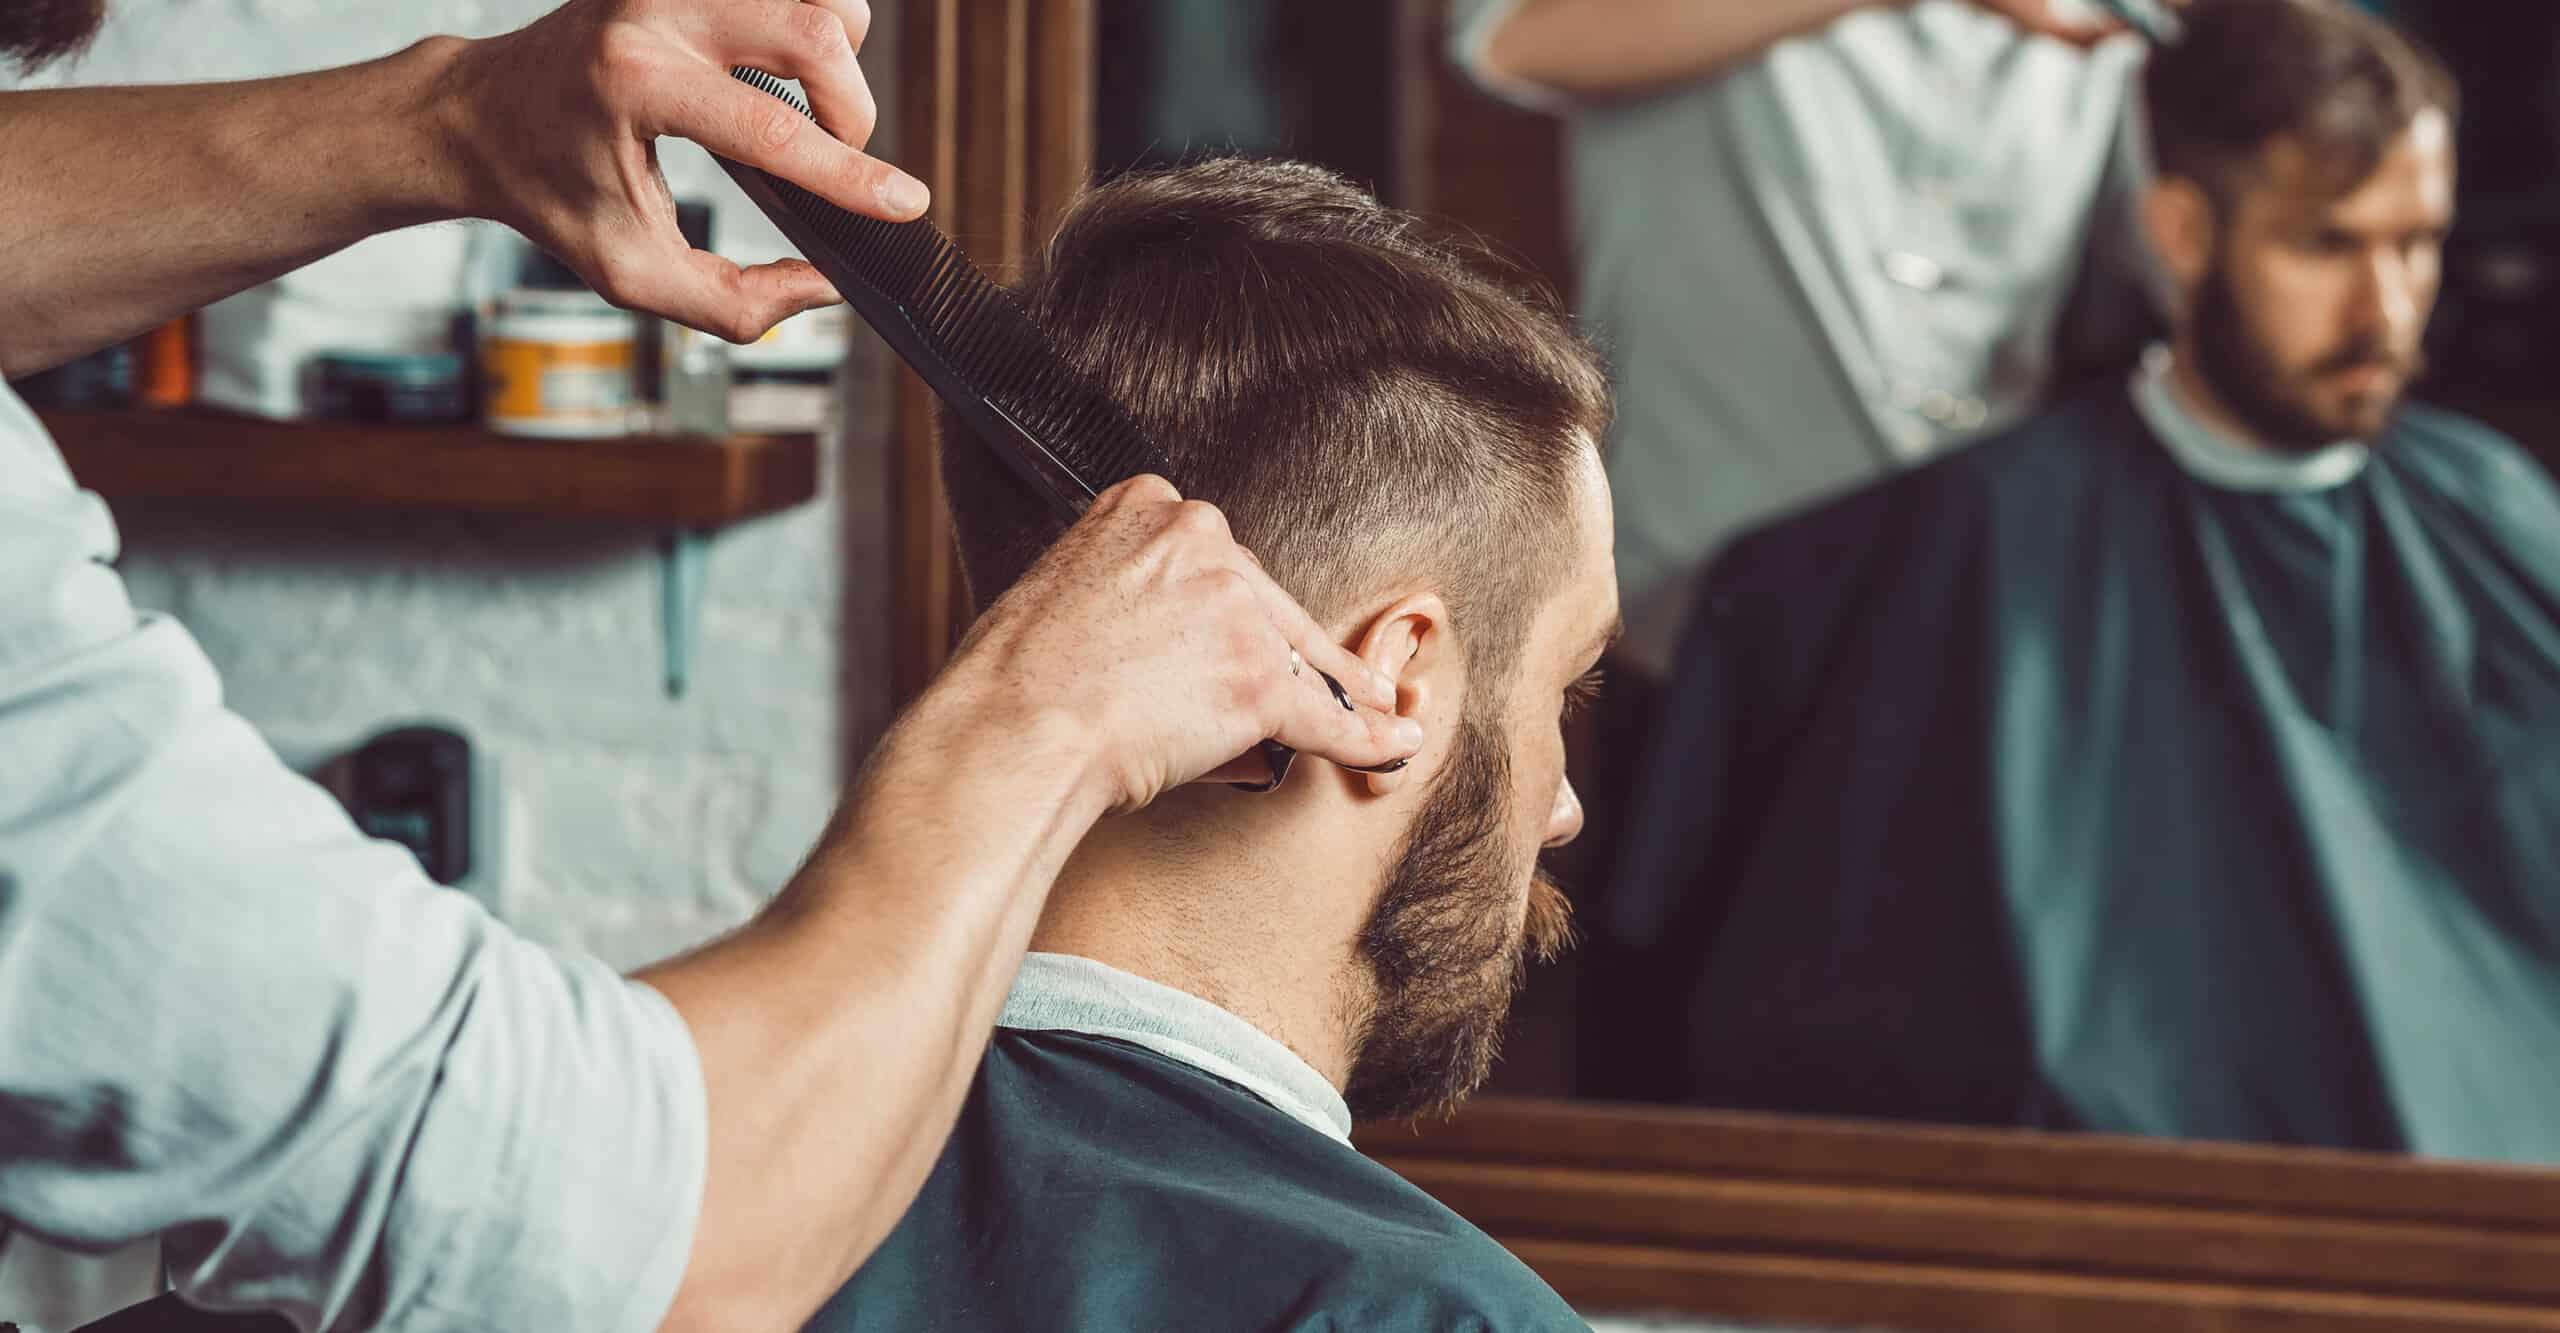 man getting haircut at a barber shop